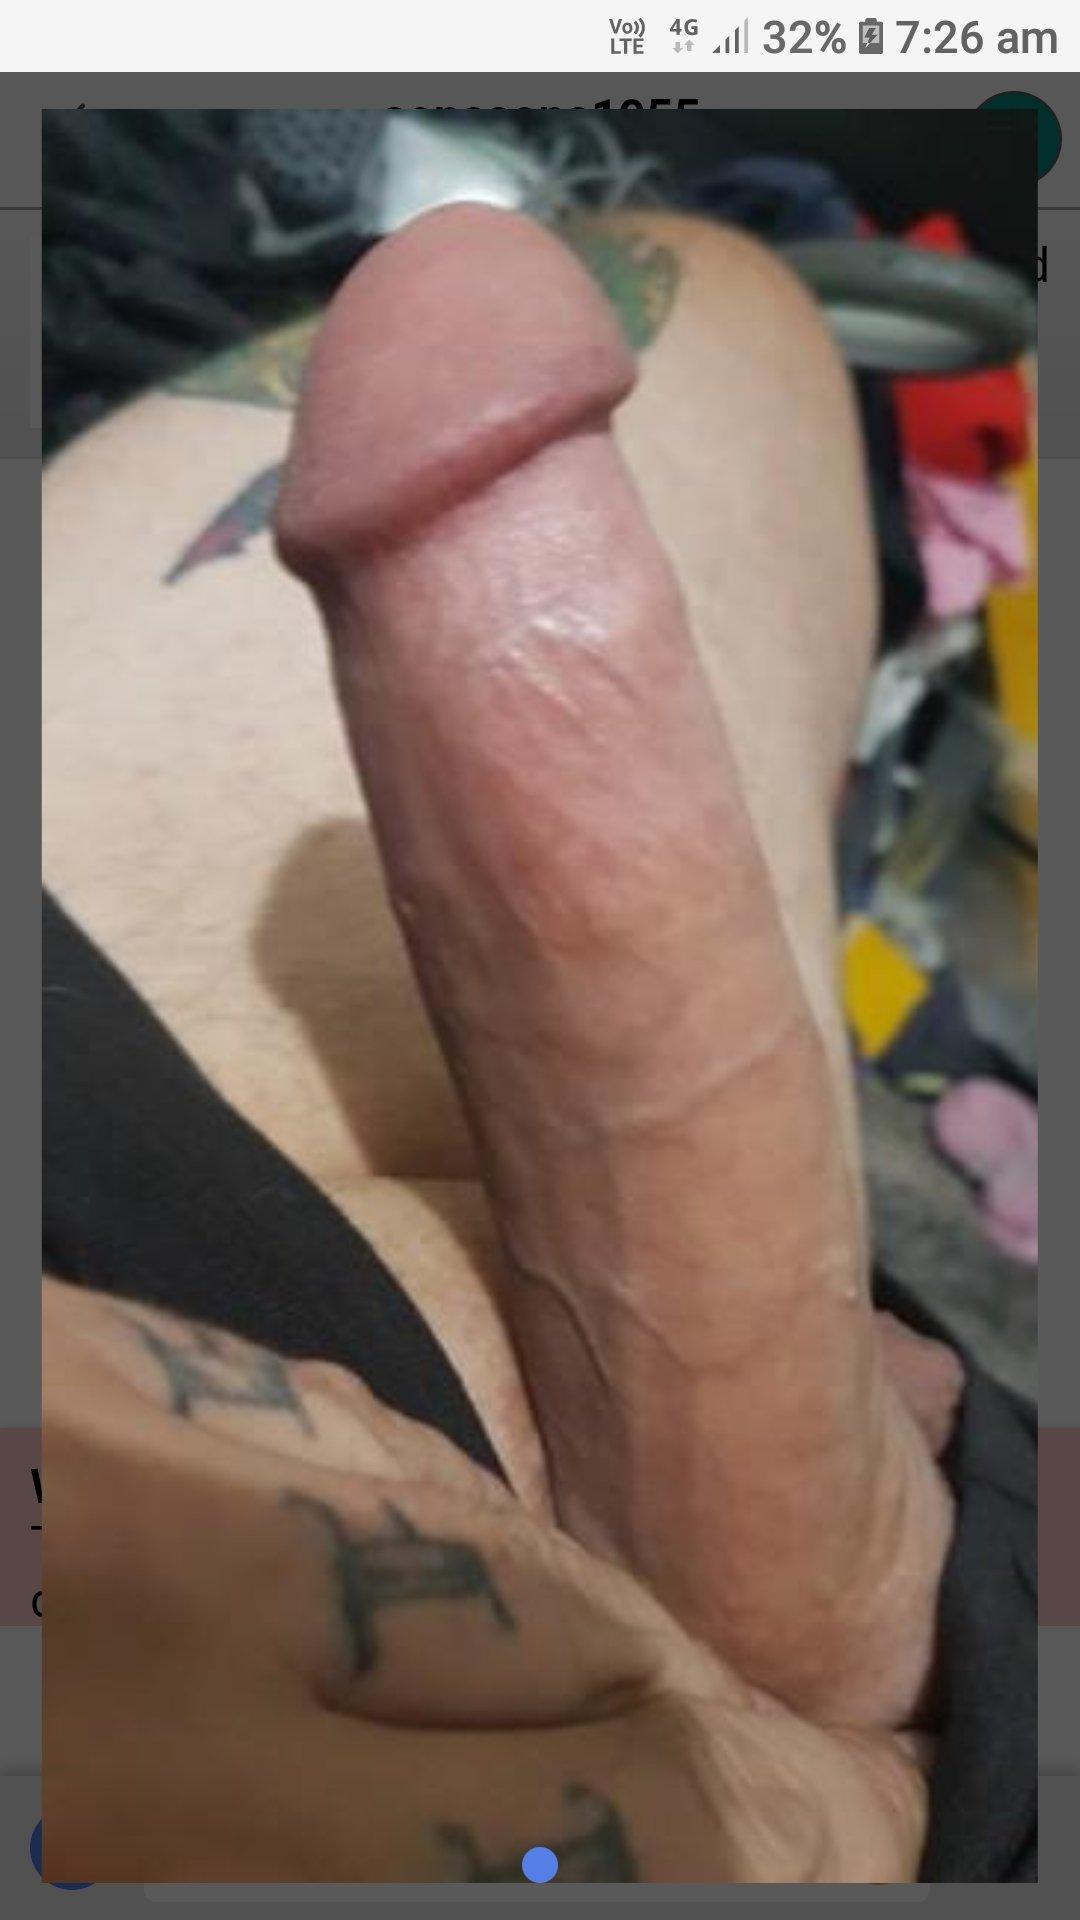 Hungcut84 from Western Australia,Australia